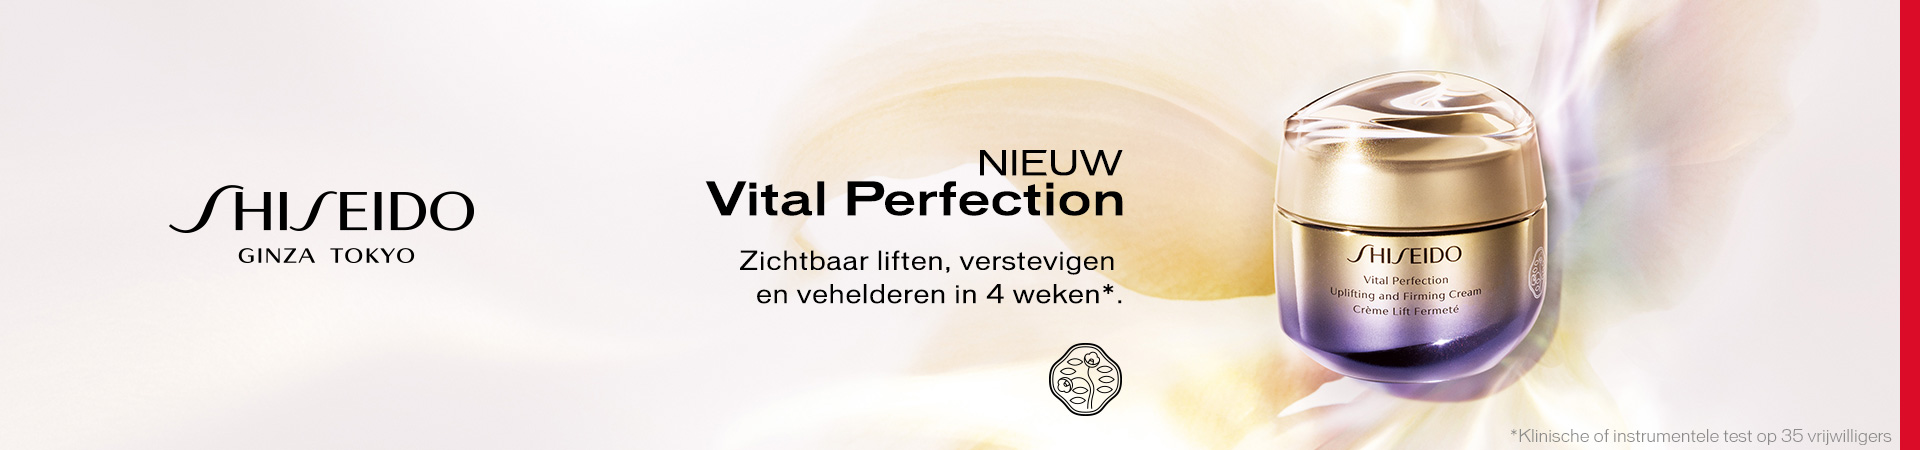 Vital Perfection